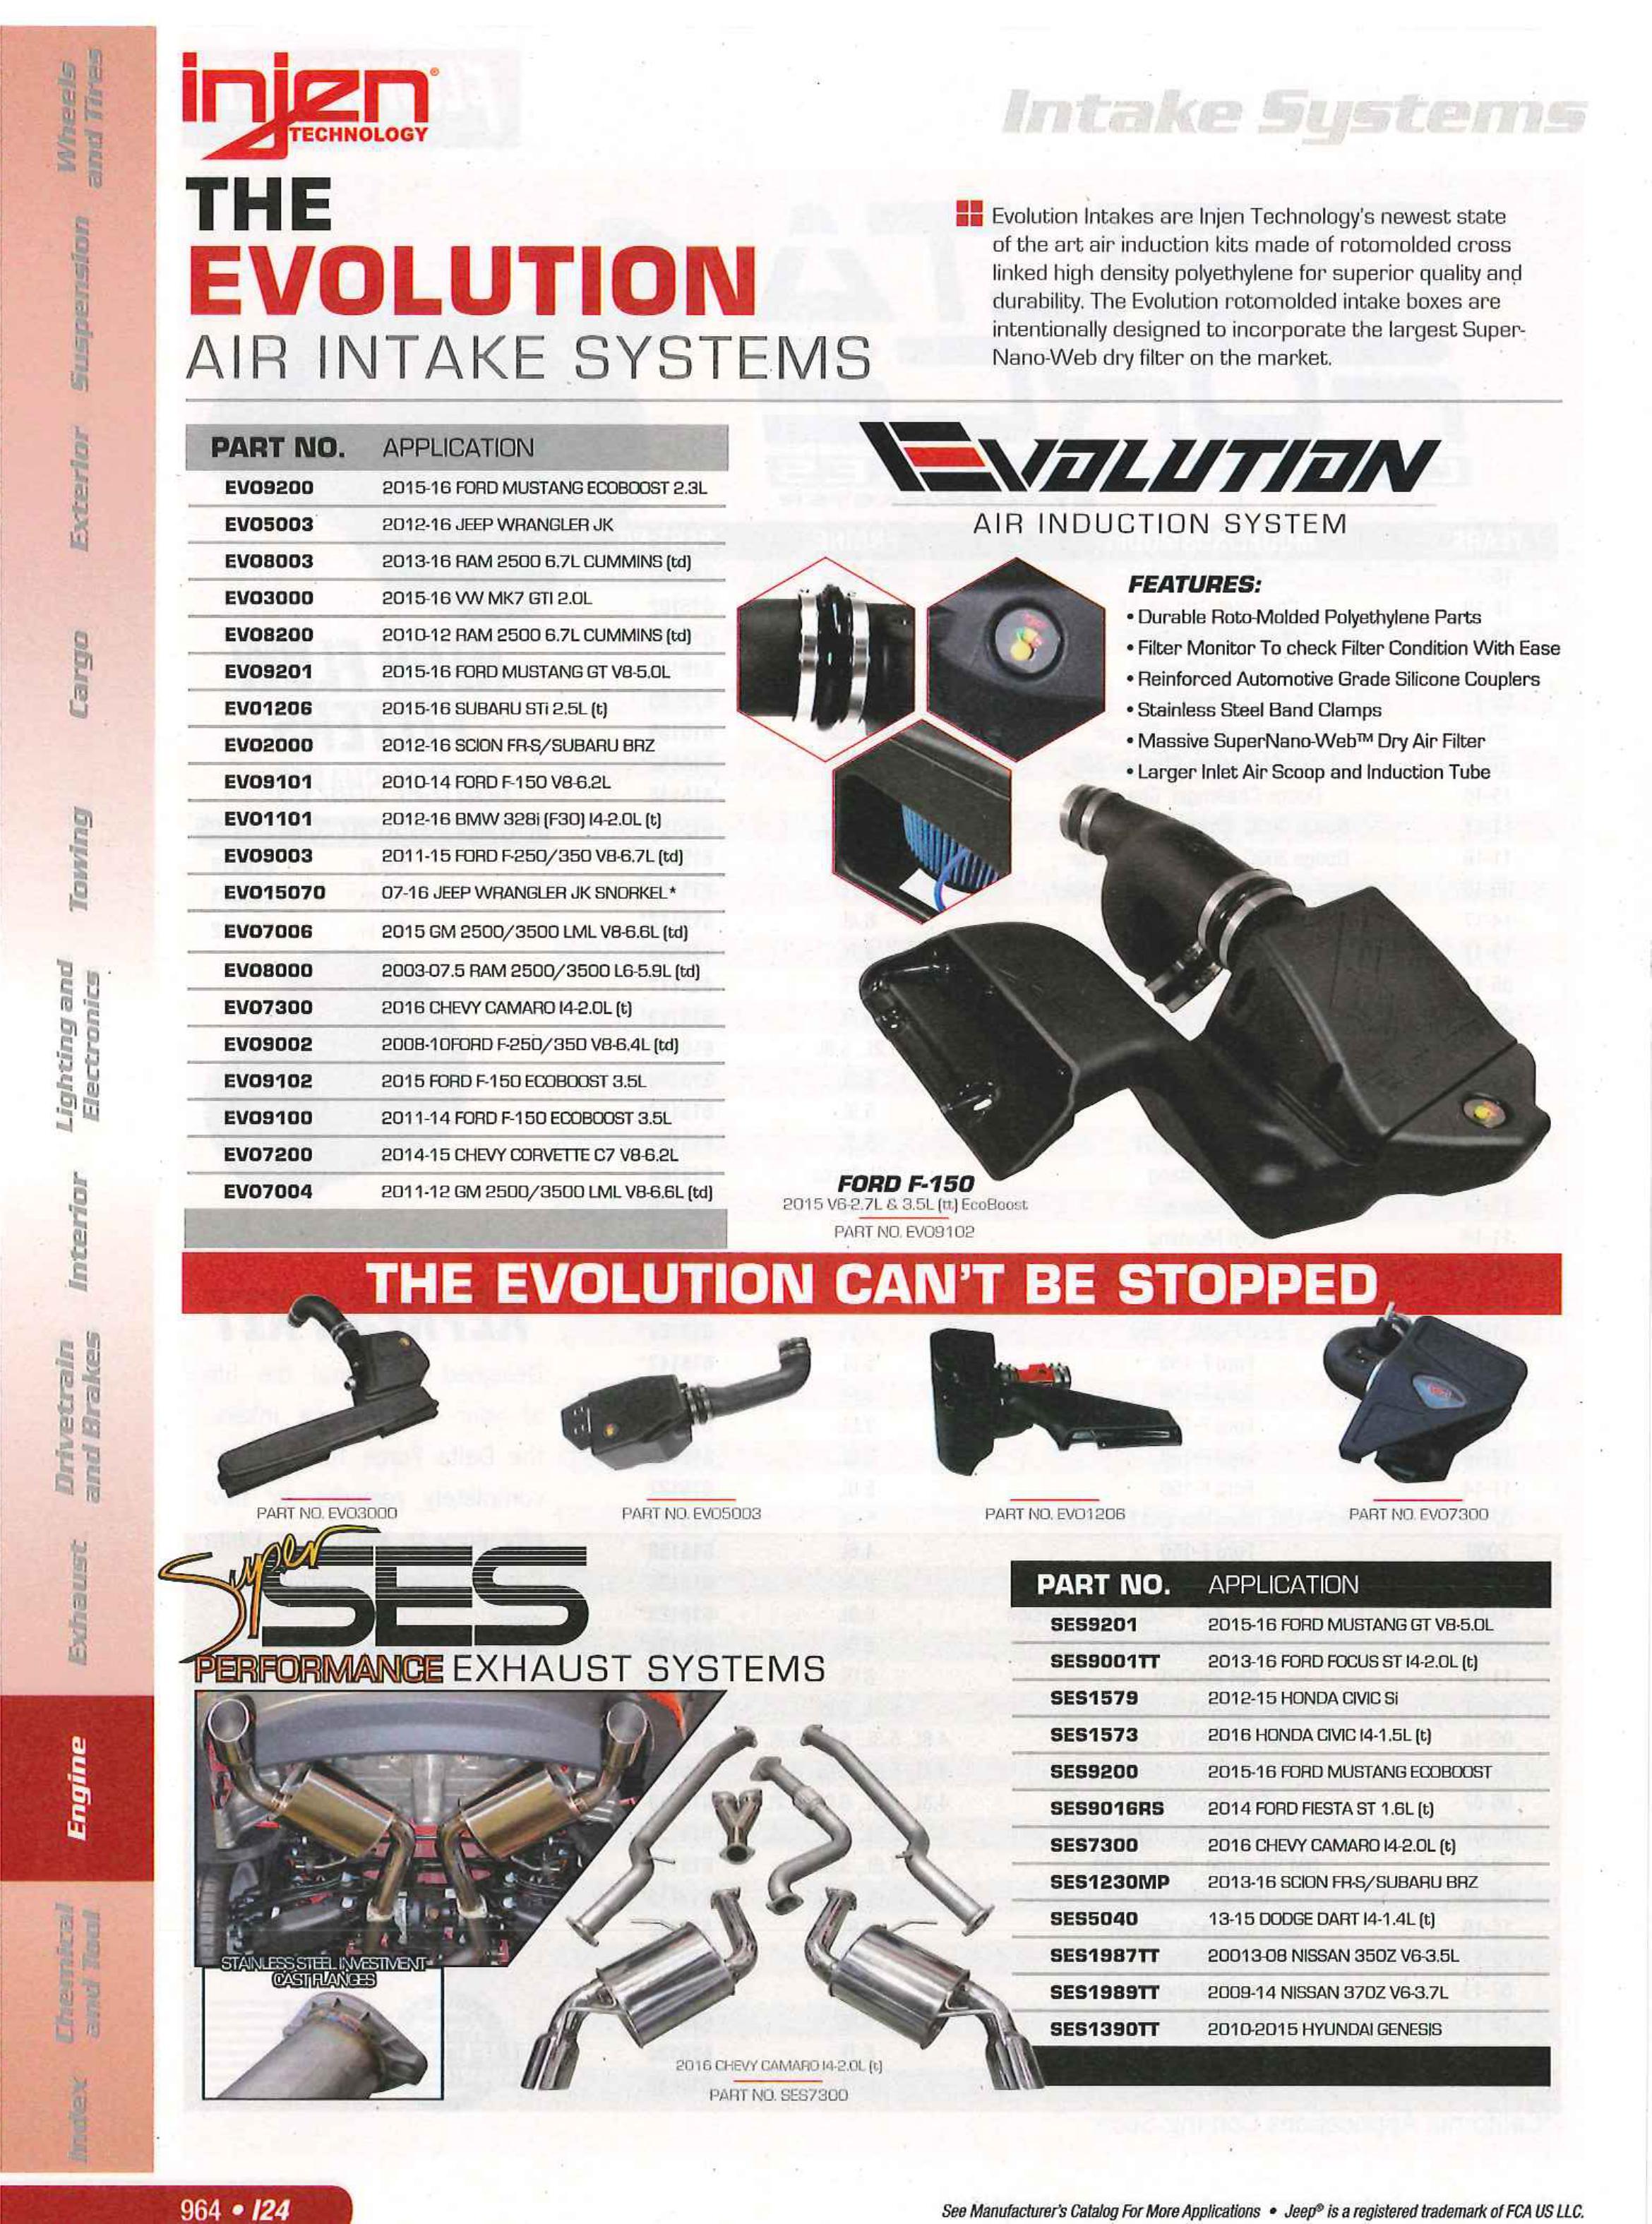 Custom Creations Truck and Car Accessories, Regina SK